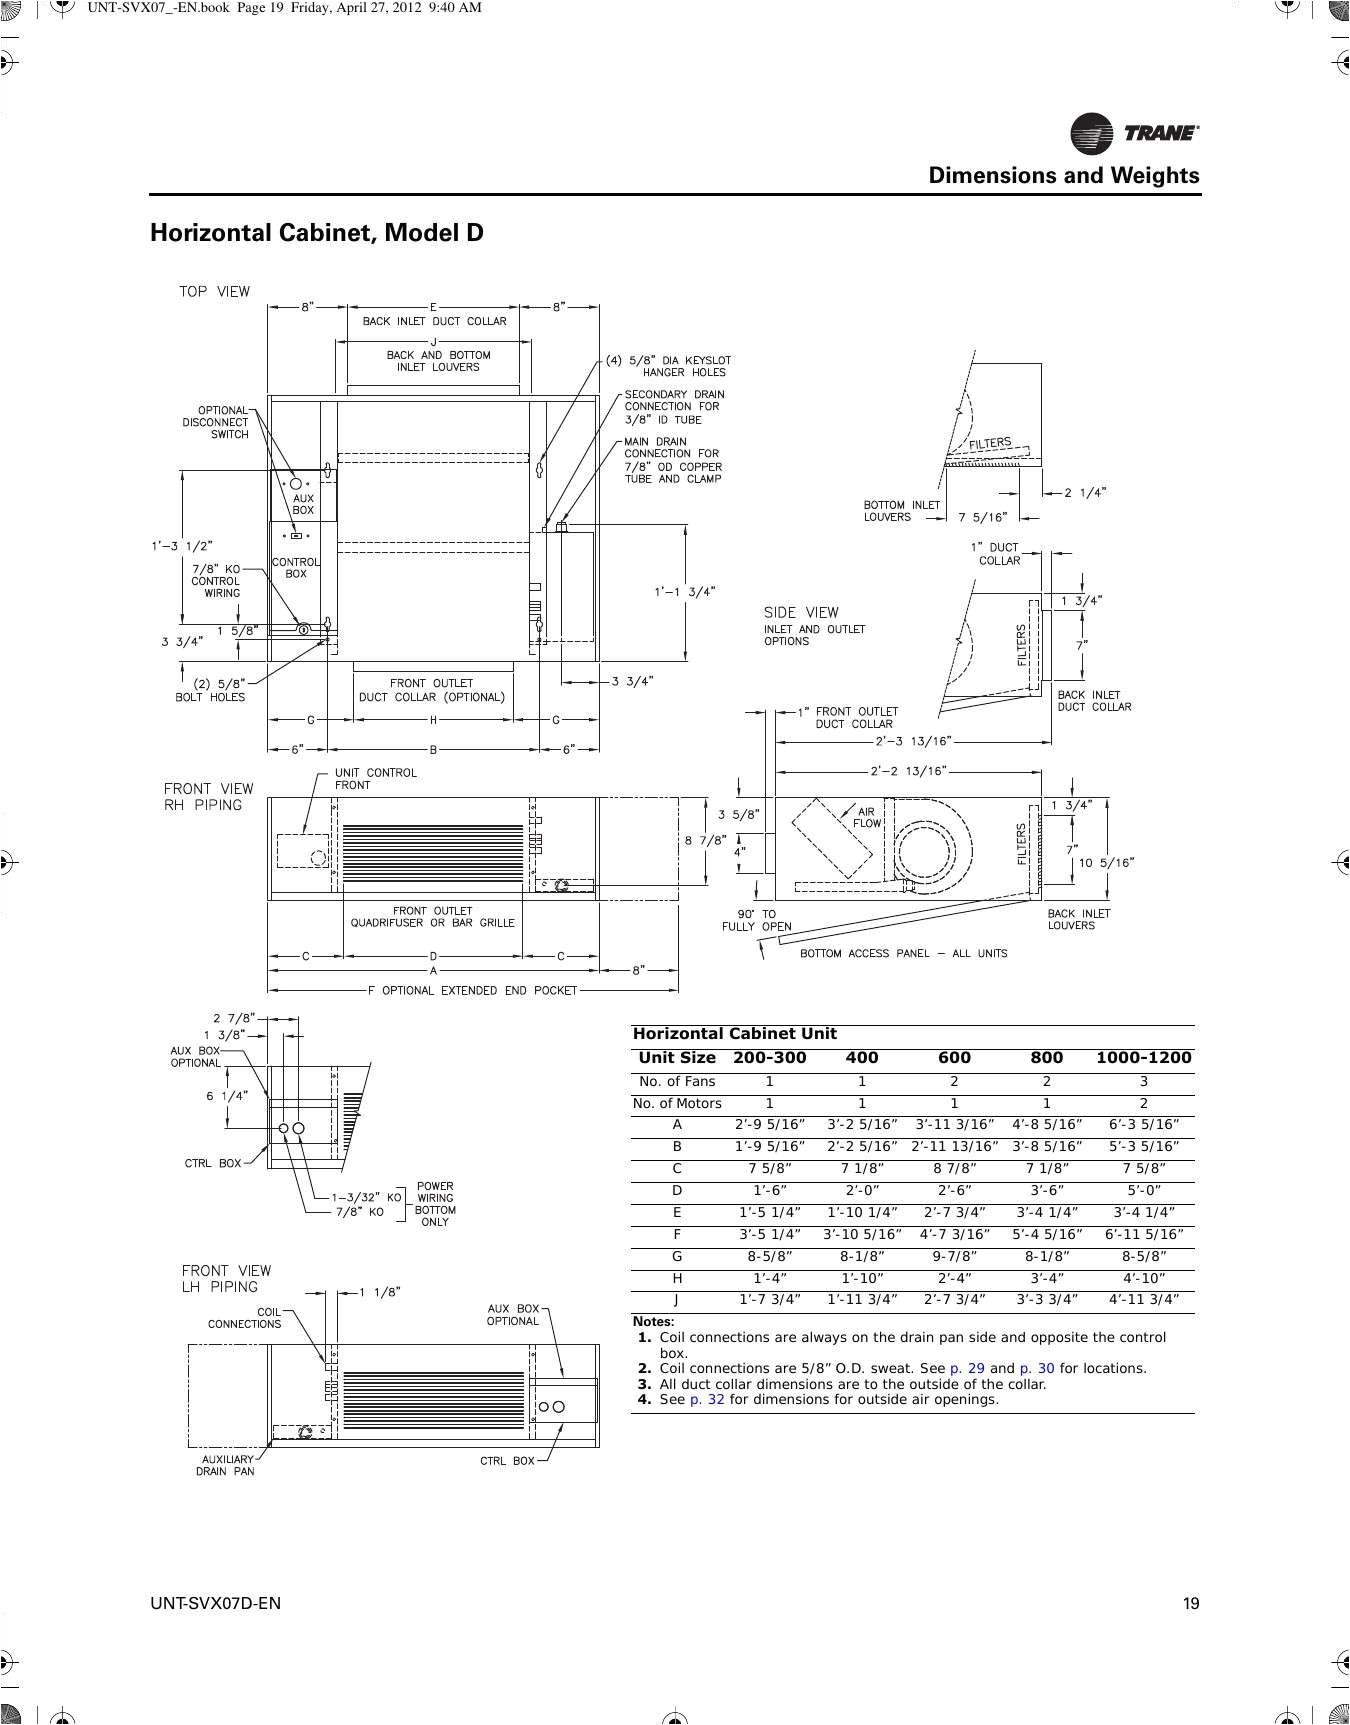 John Deere Wiring Diagram Download John Deere Wiring Diagram Download Inspirational Love Star Ind Corp